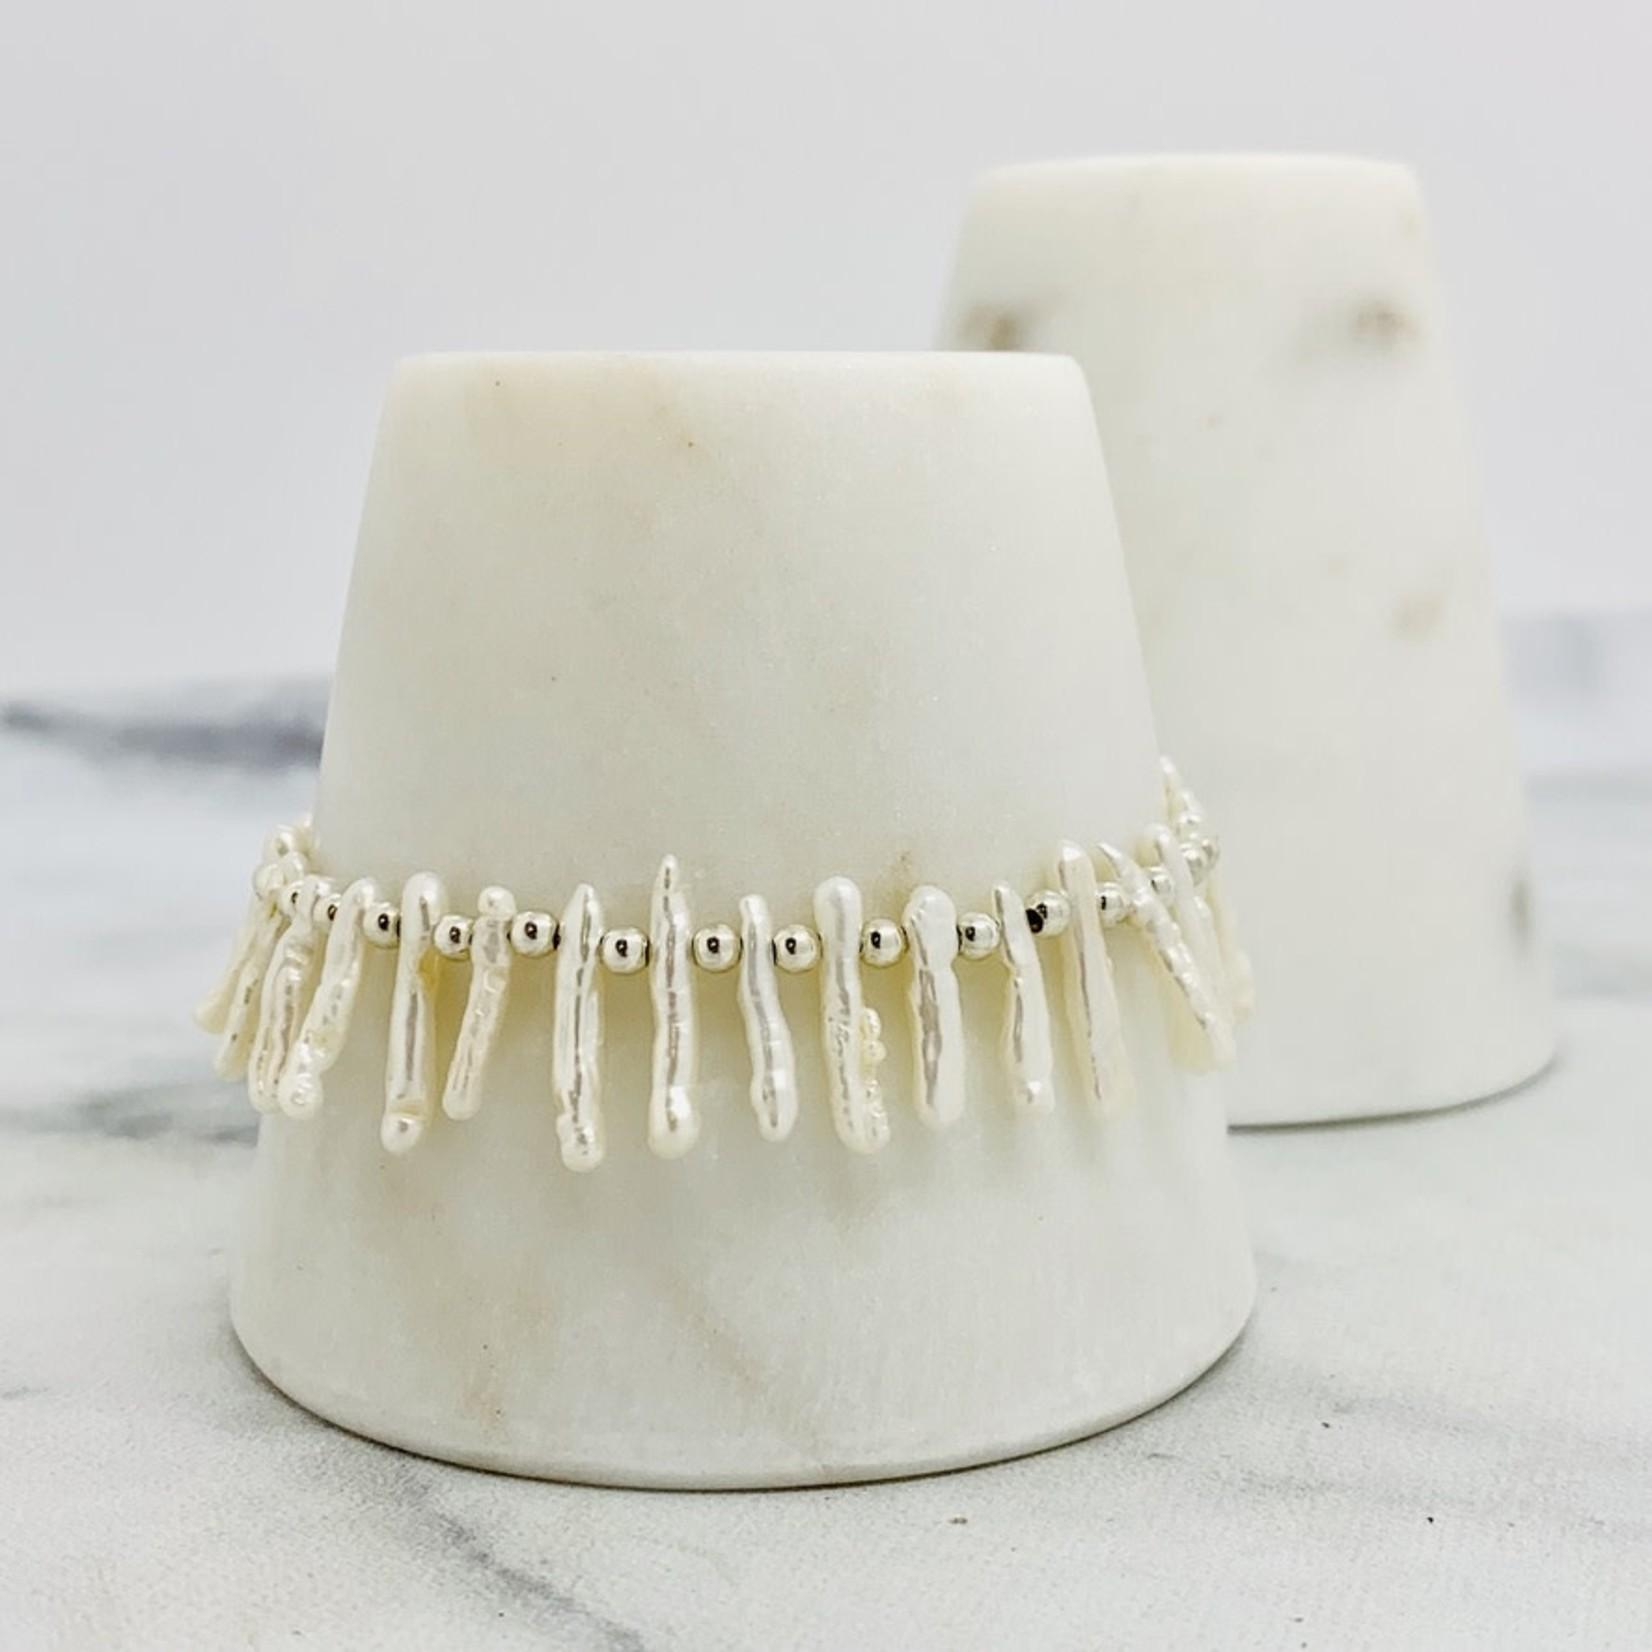 EVANKNOX Handmade Bracelet with white stick pearls, silver balls between